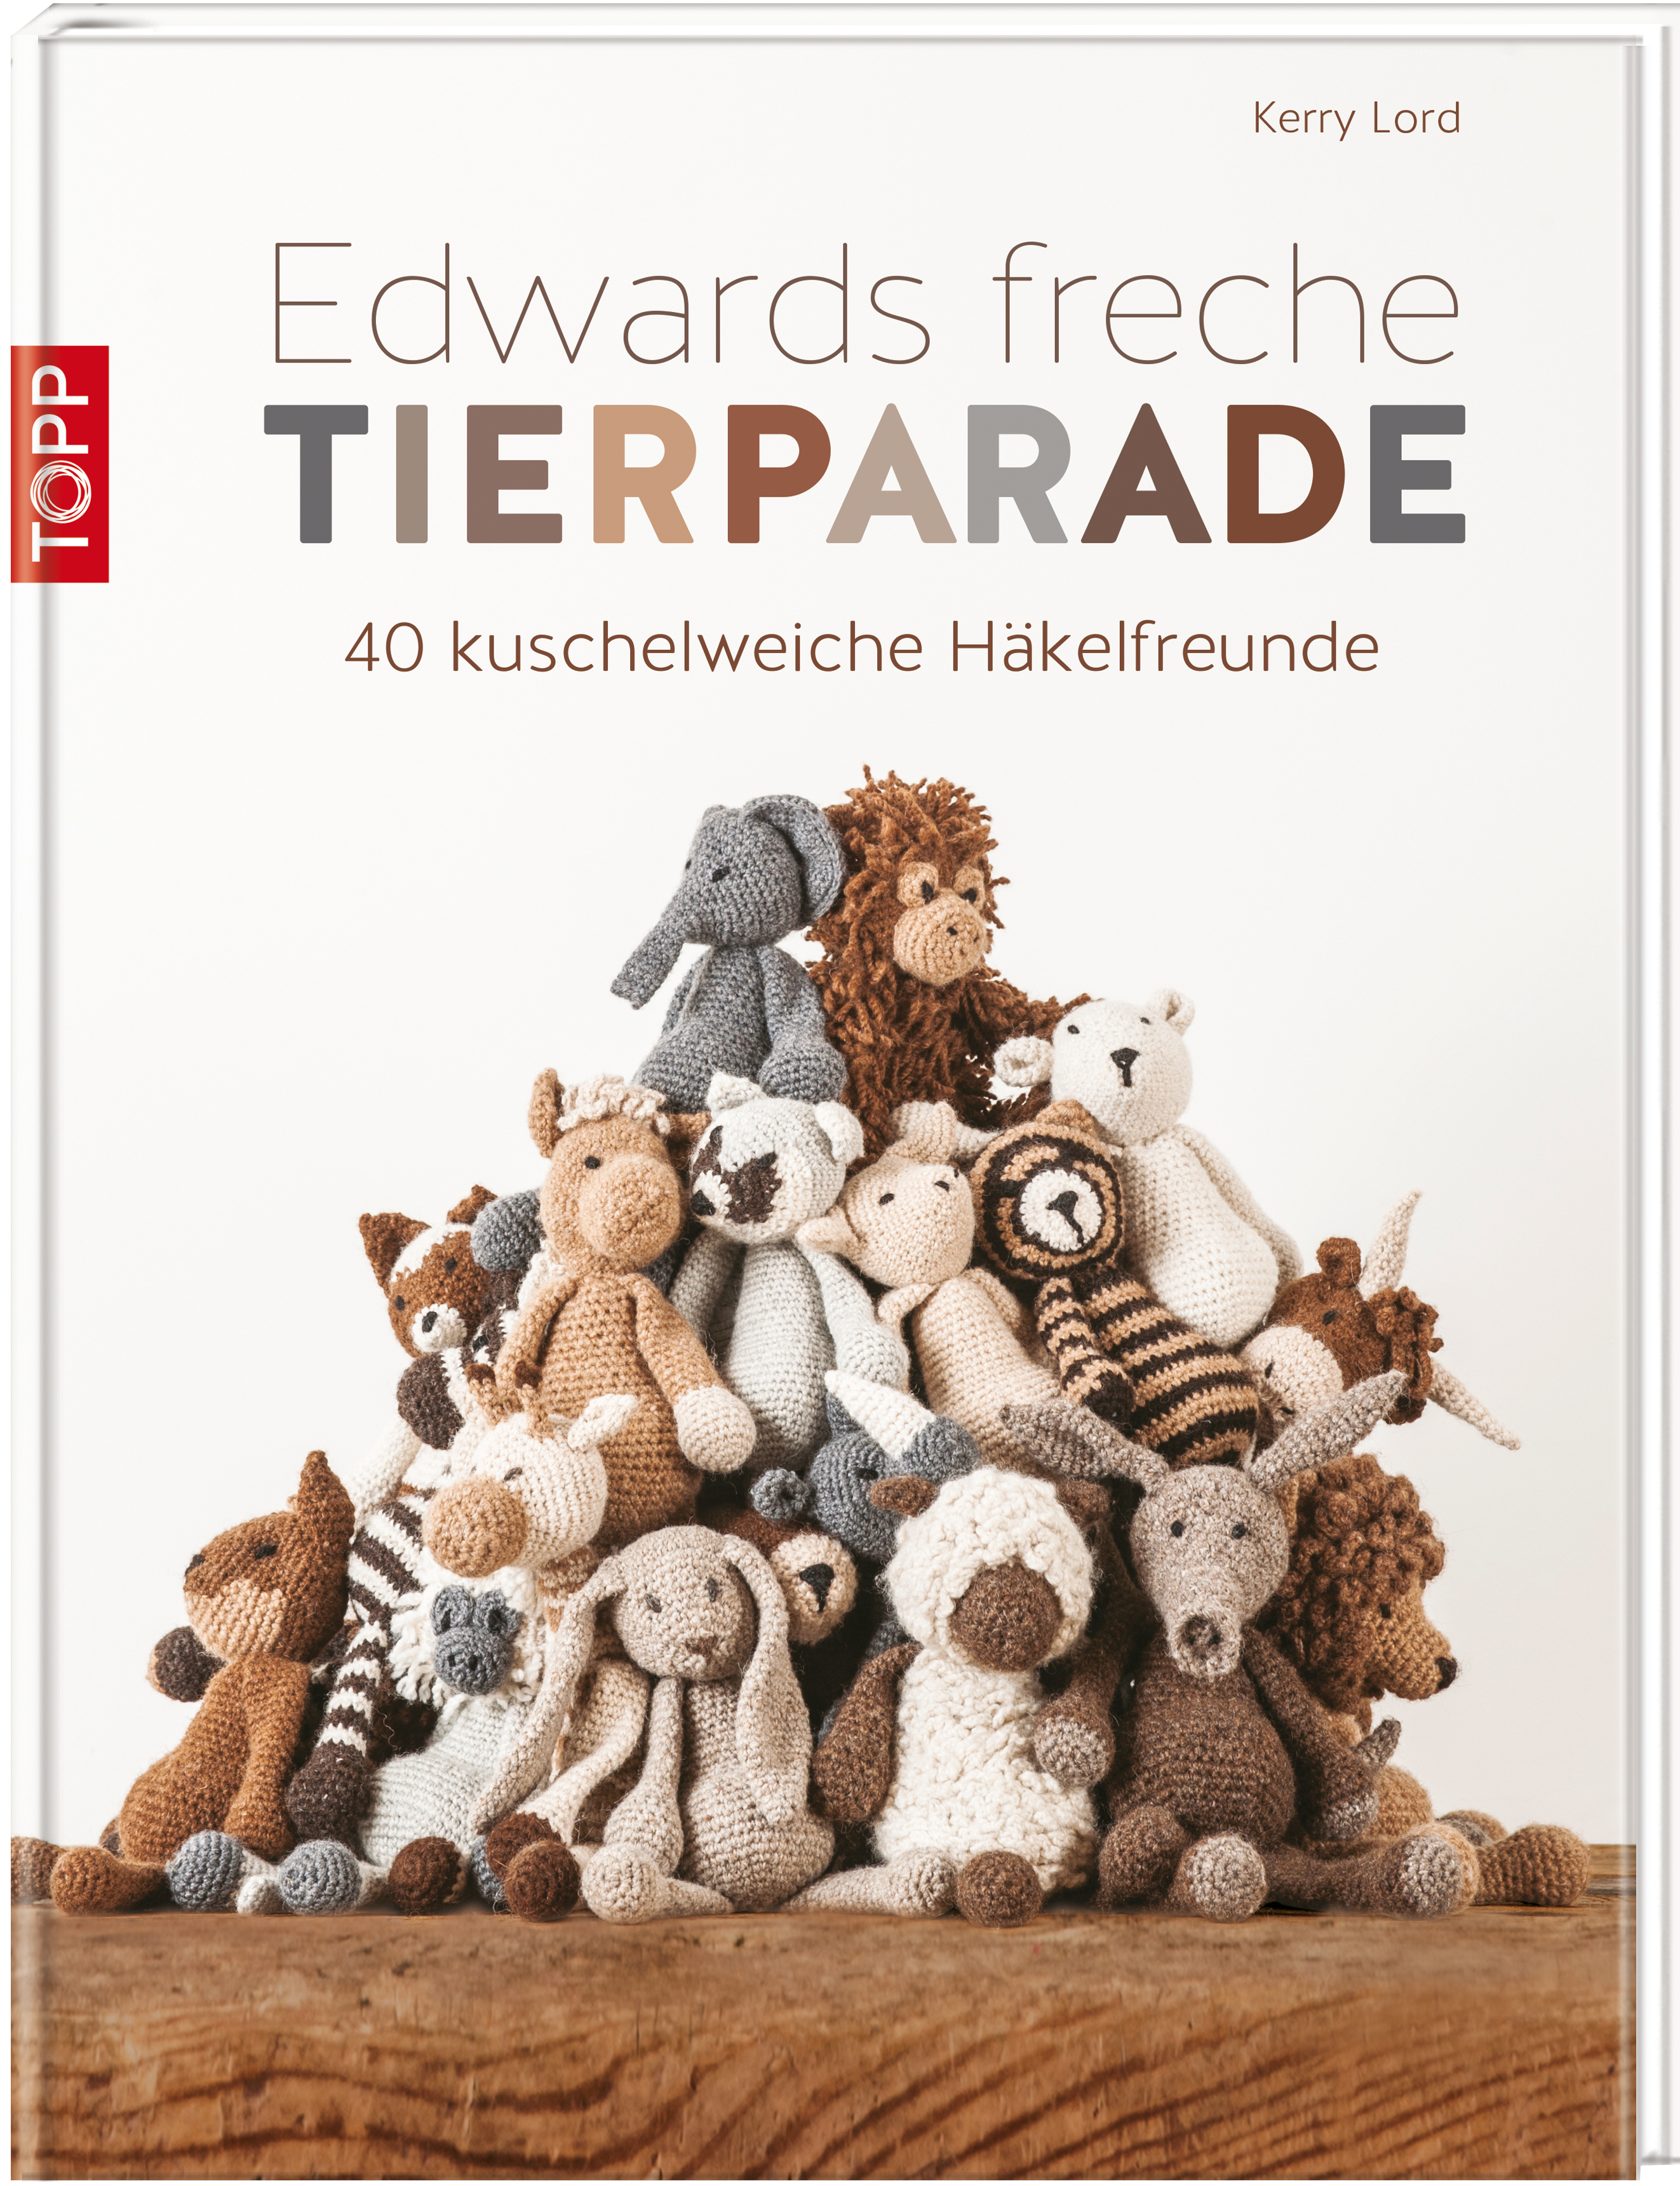 Edwards freche Tierparade: 40 kuschelweiche Häkelfreunde - Kerry Lord [Gebundene Ausgabe]